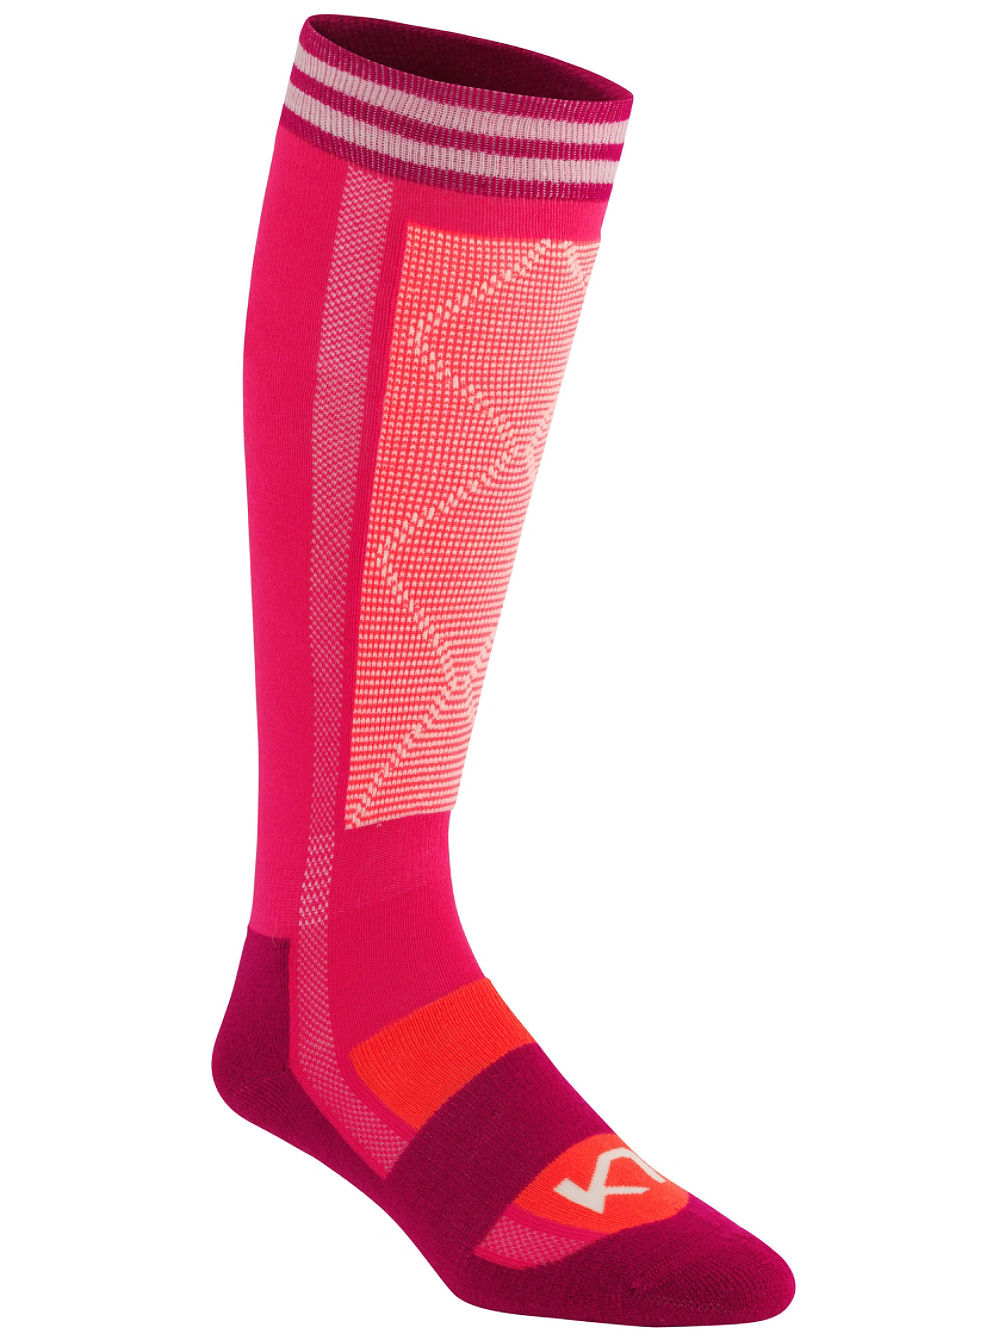 acro-tech-socks-38-39